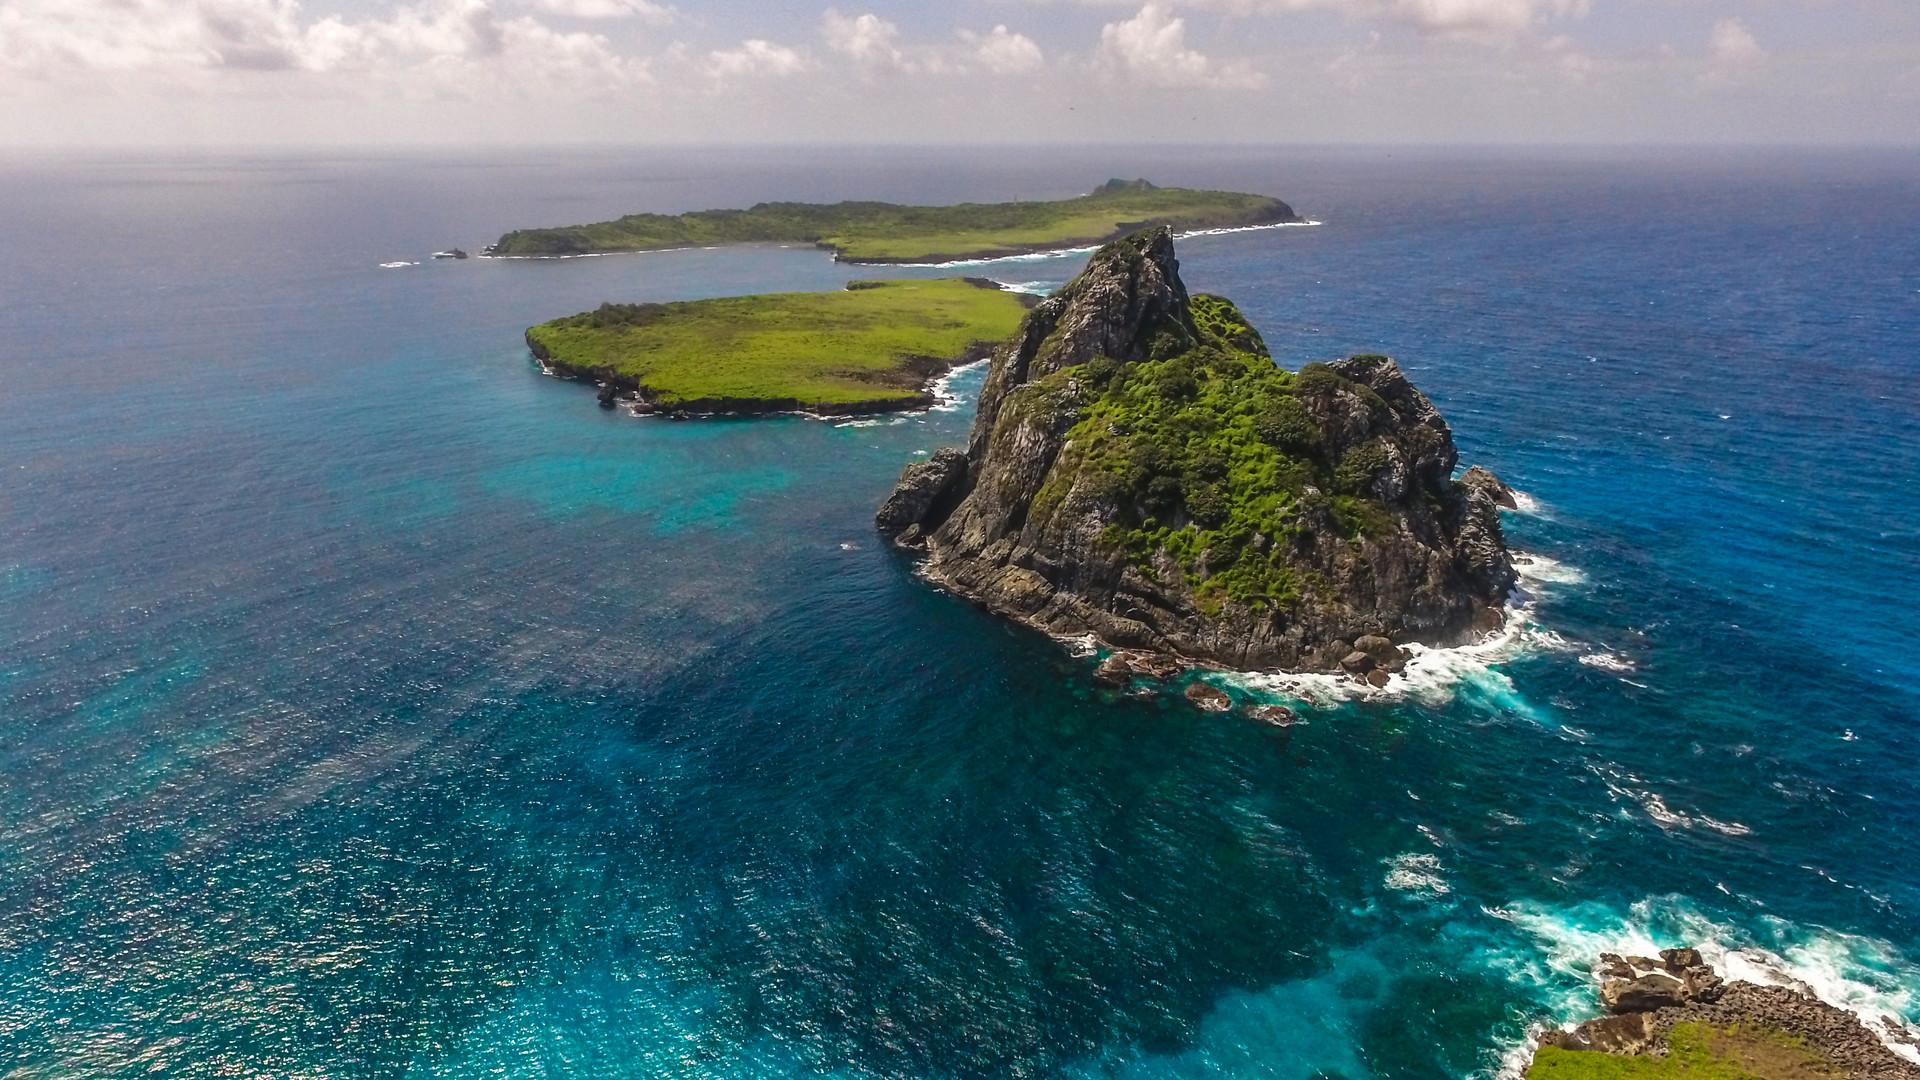 Arquipélago_de_Fernando_de_Noronha.jpg